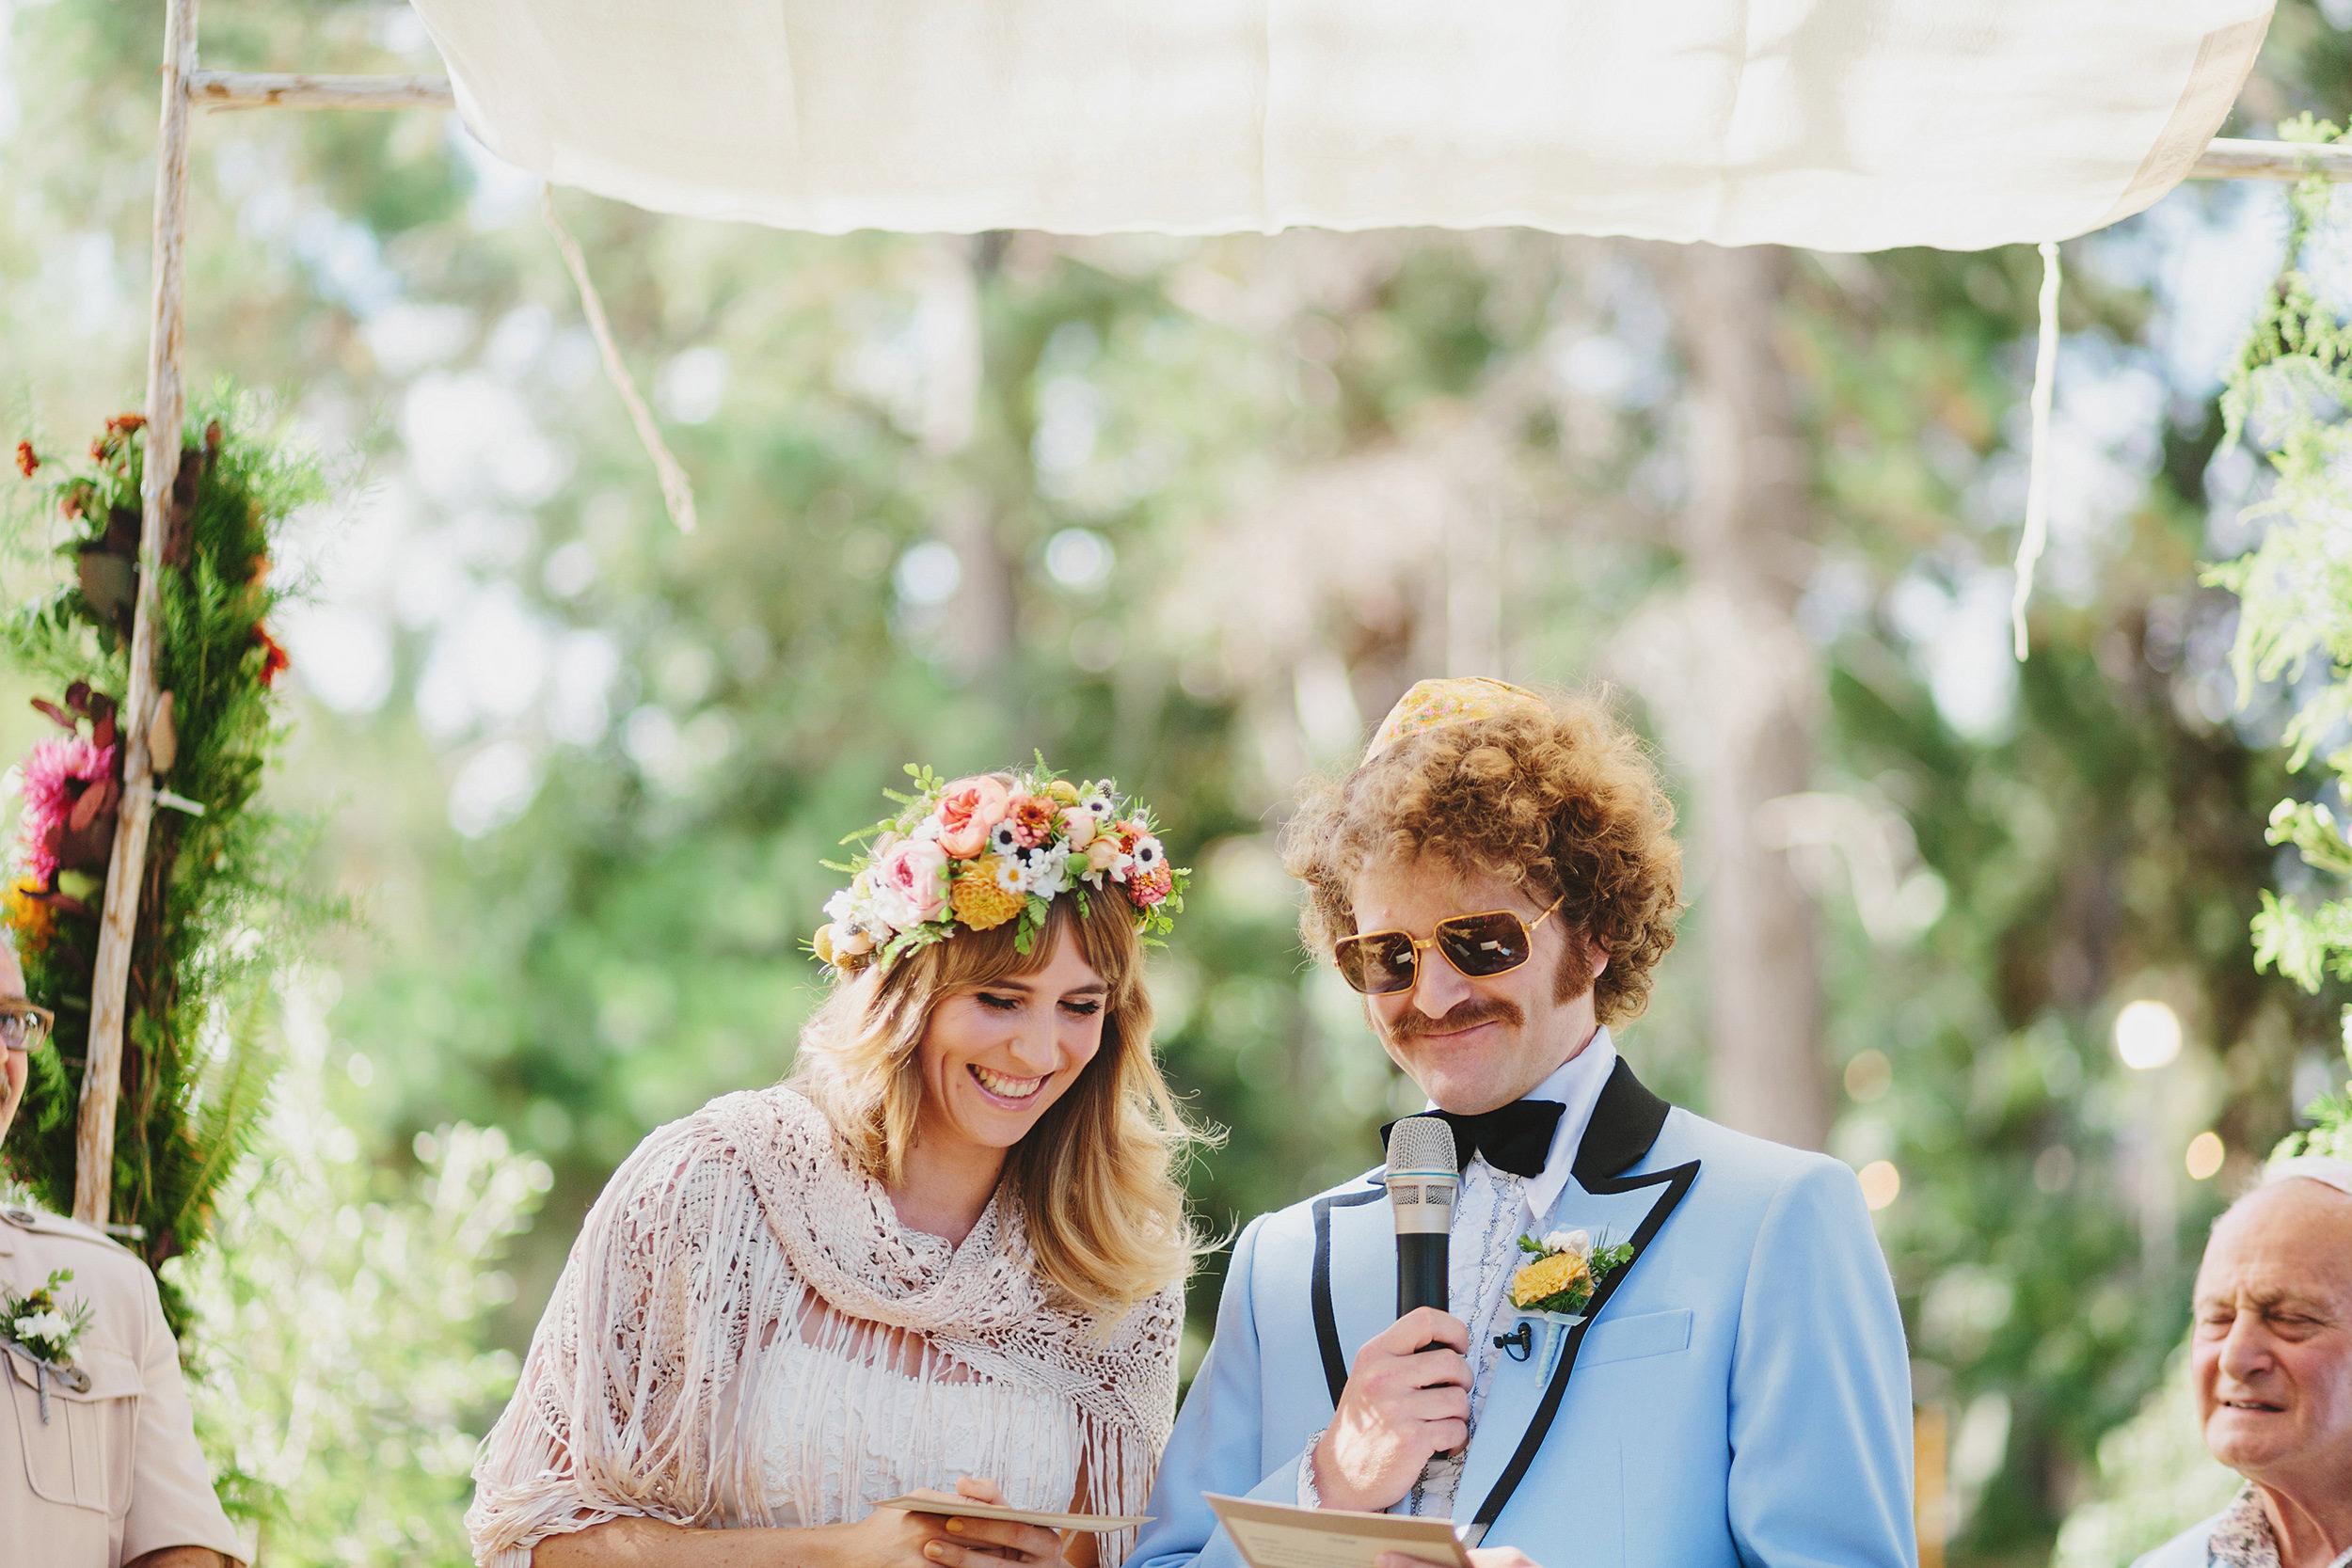 Melbourne_Vintage_Backyard_Wedding_Ben_Erin 025.JPG